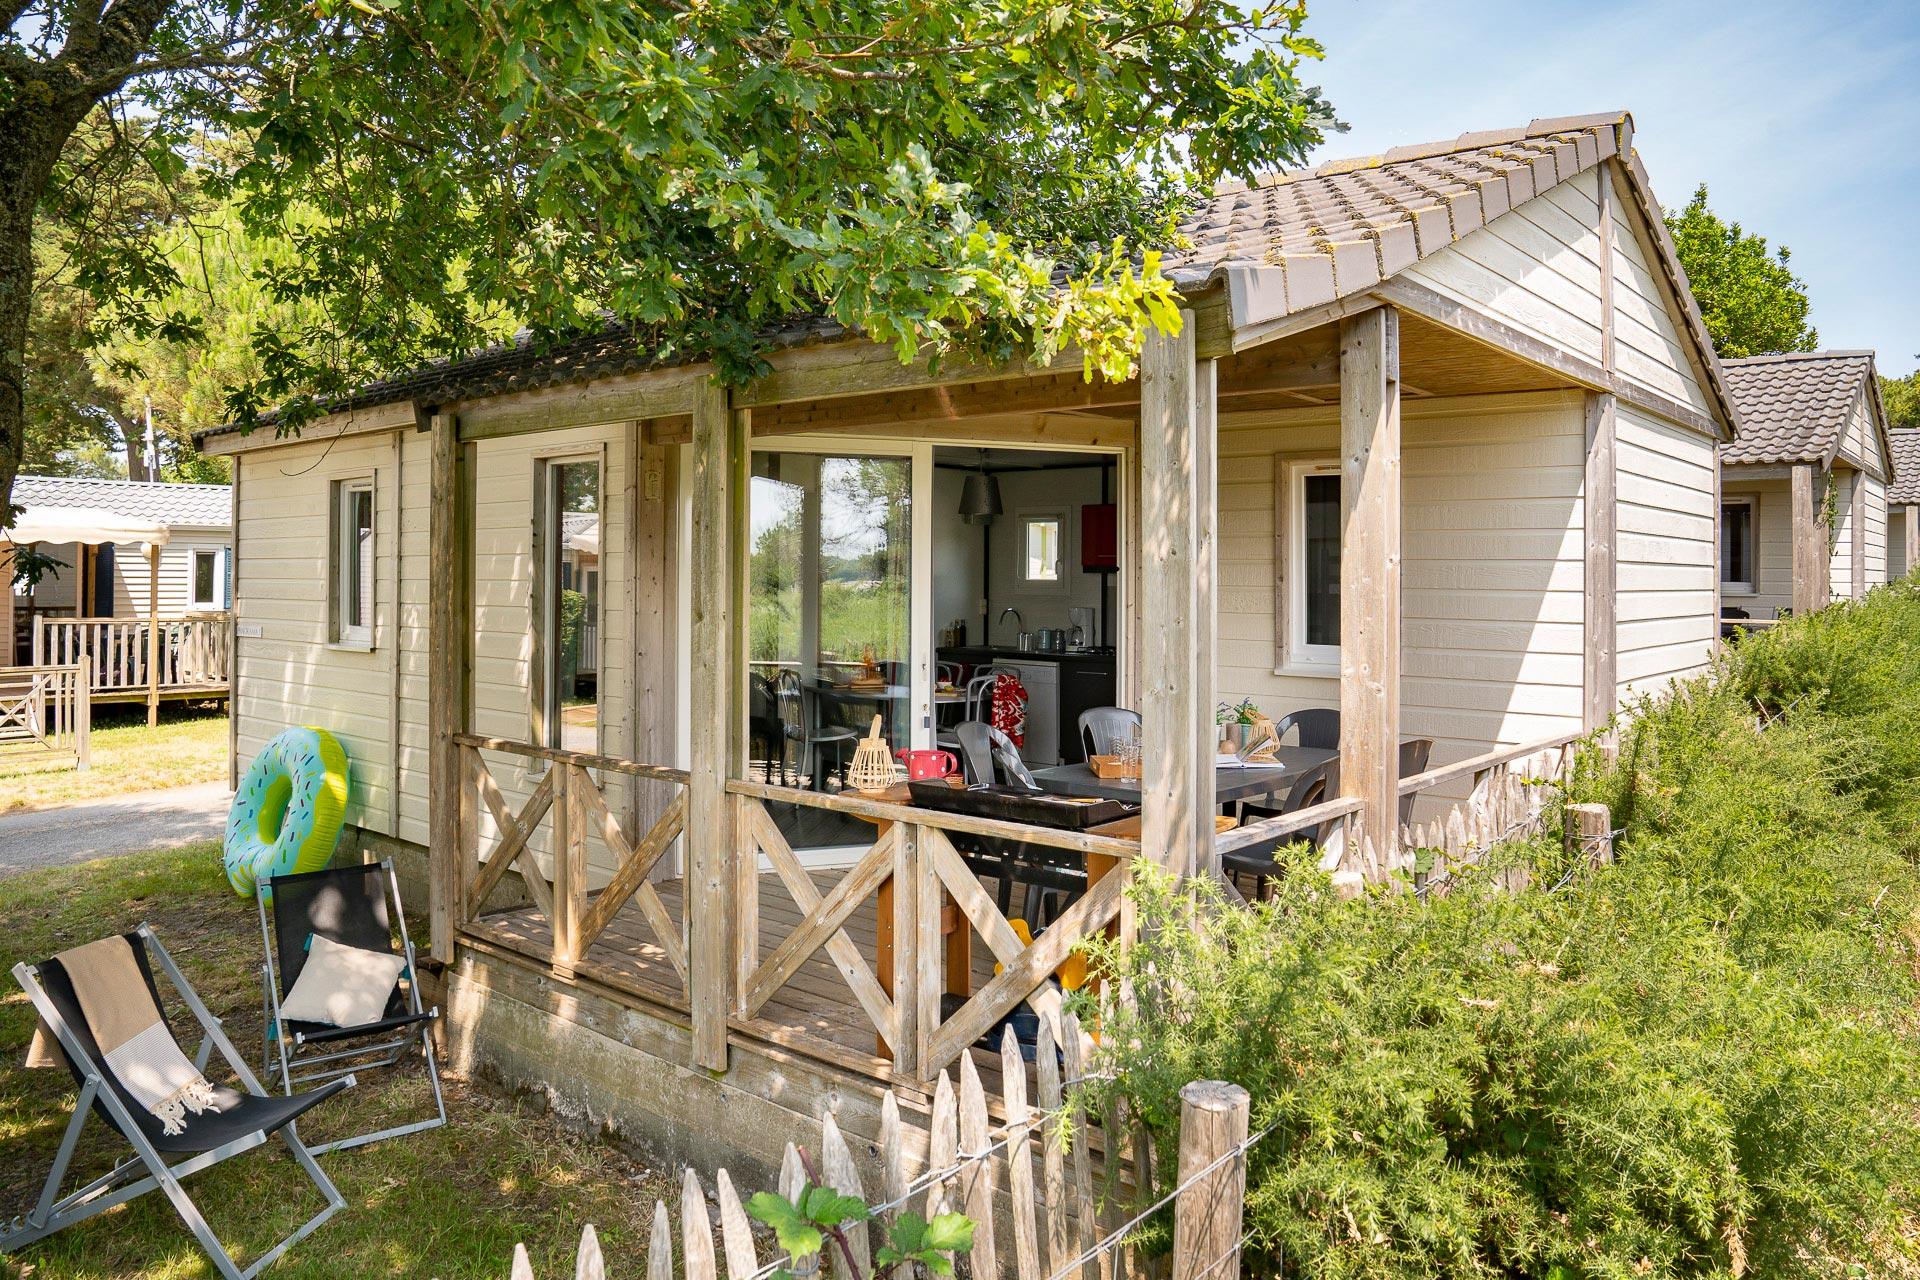 Location - Chalet 2 Chambres Vue Mer **** - Camping Sandaya Le Moulin de l'Eclis